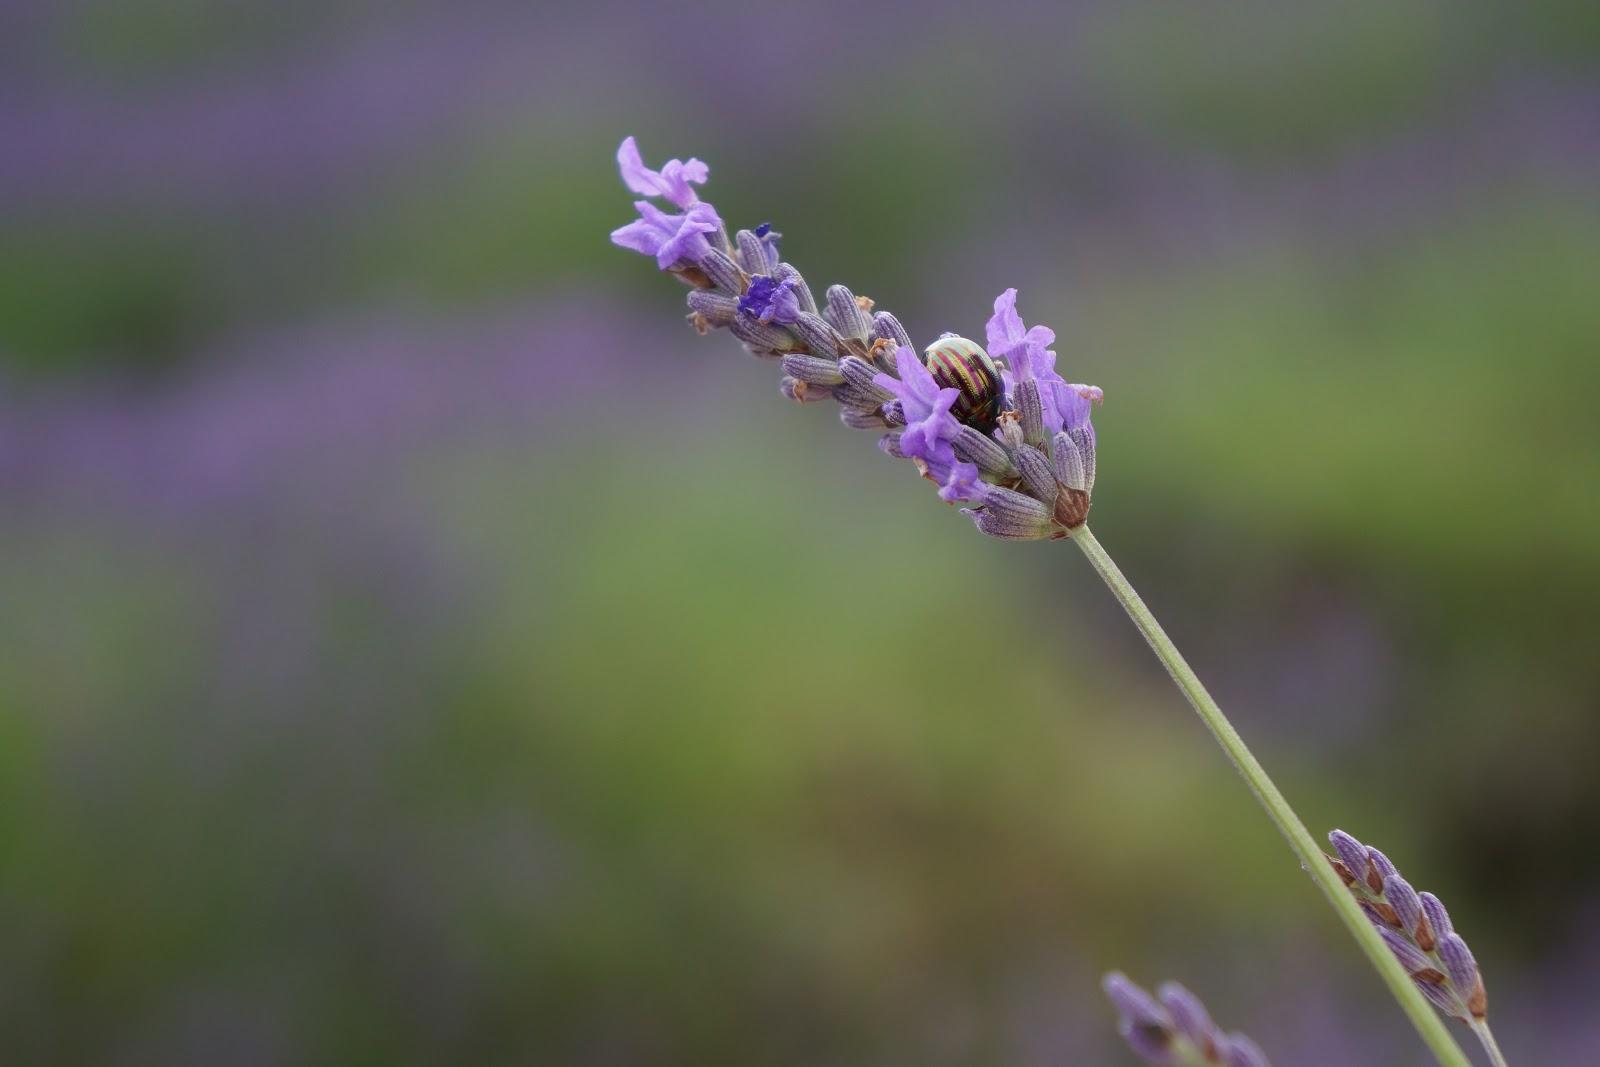 beetle on a lavender flower